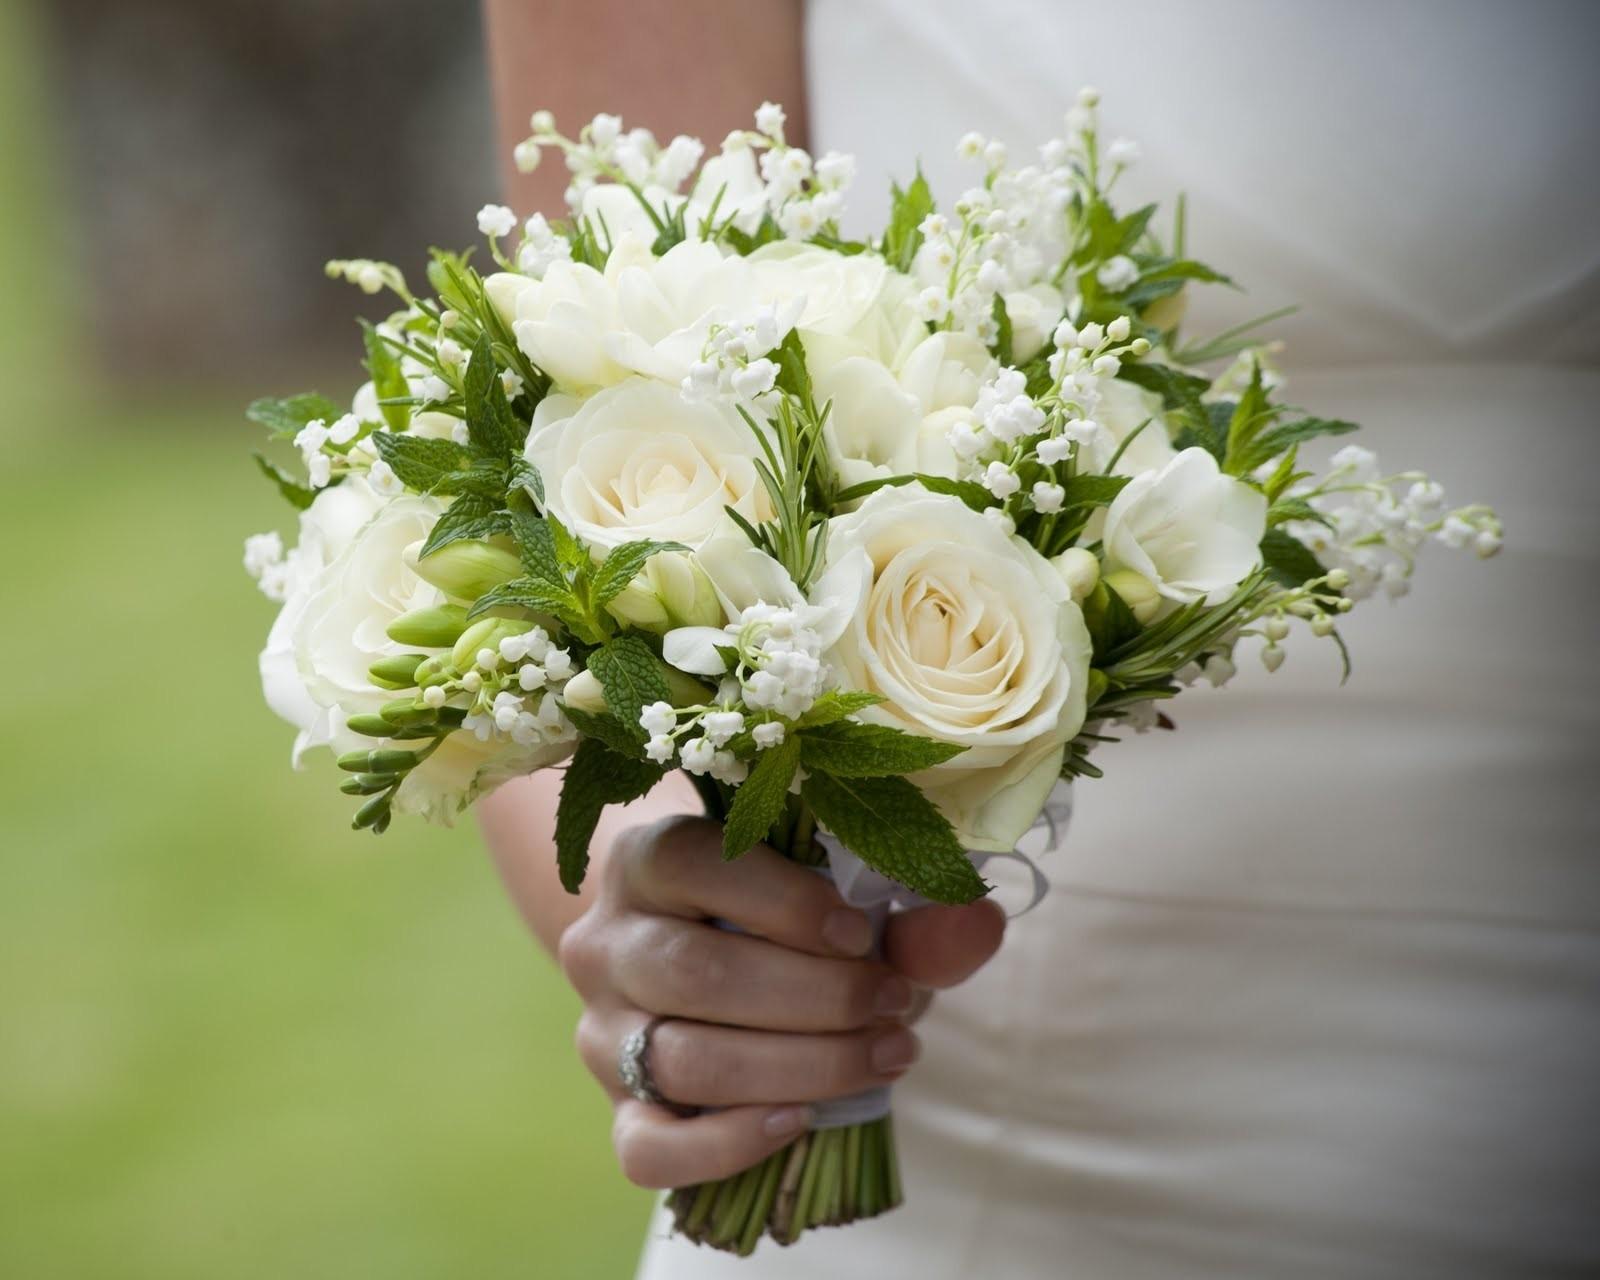 wedding anniversary flowers by year photo - 1